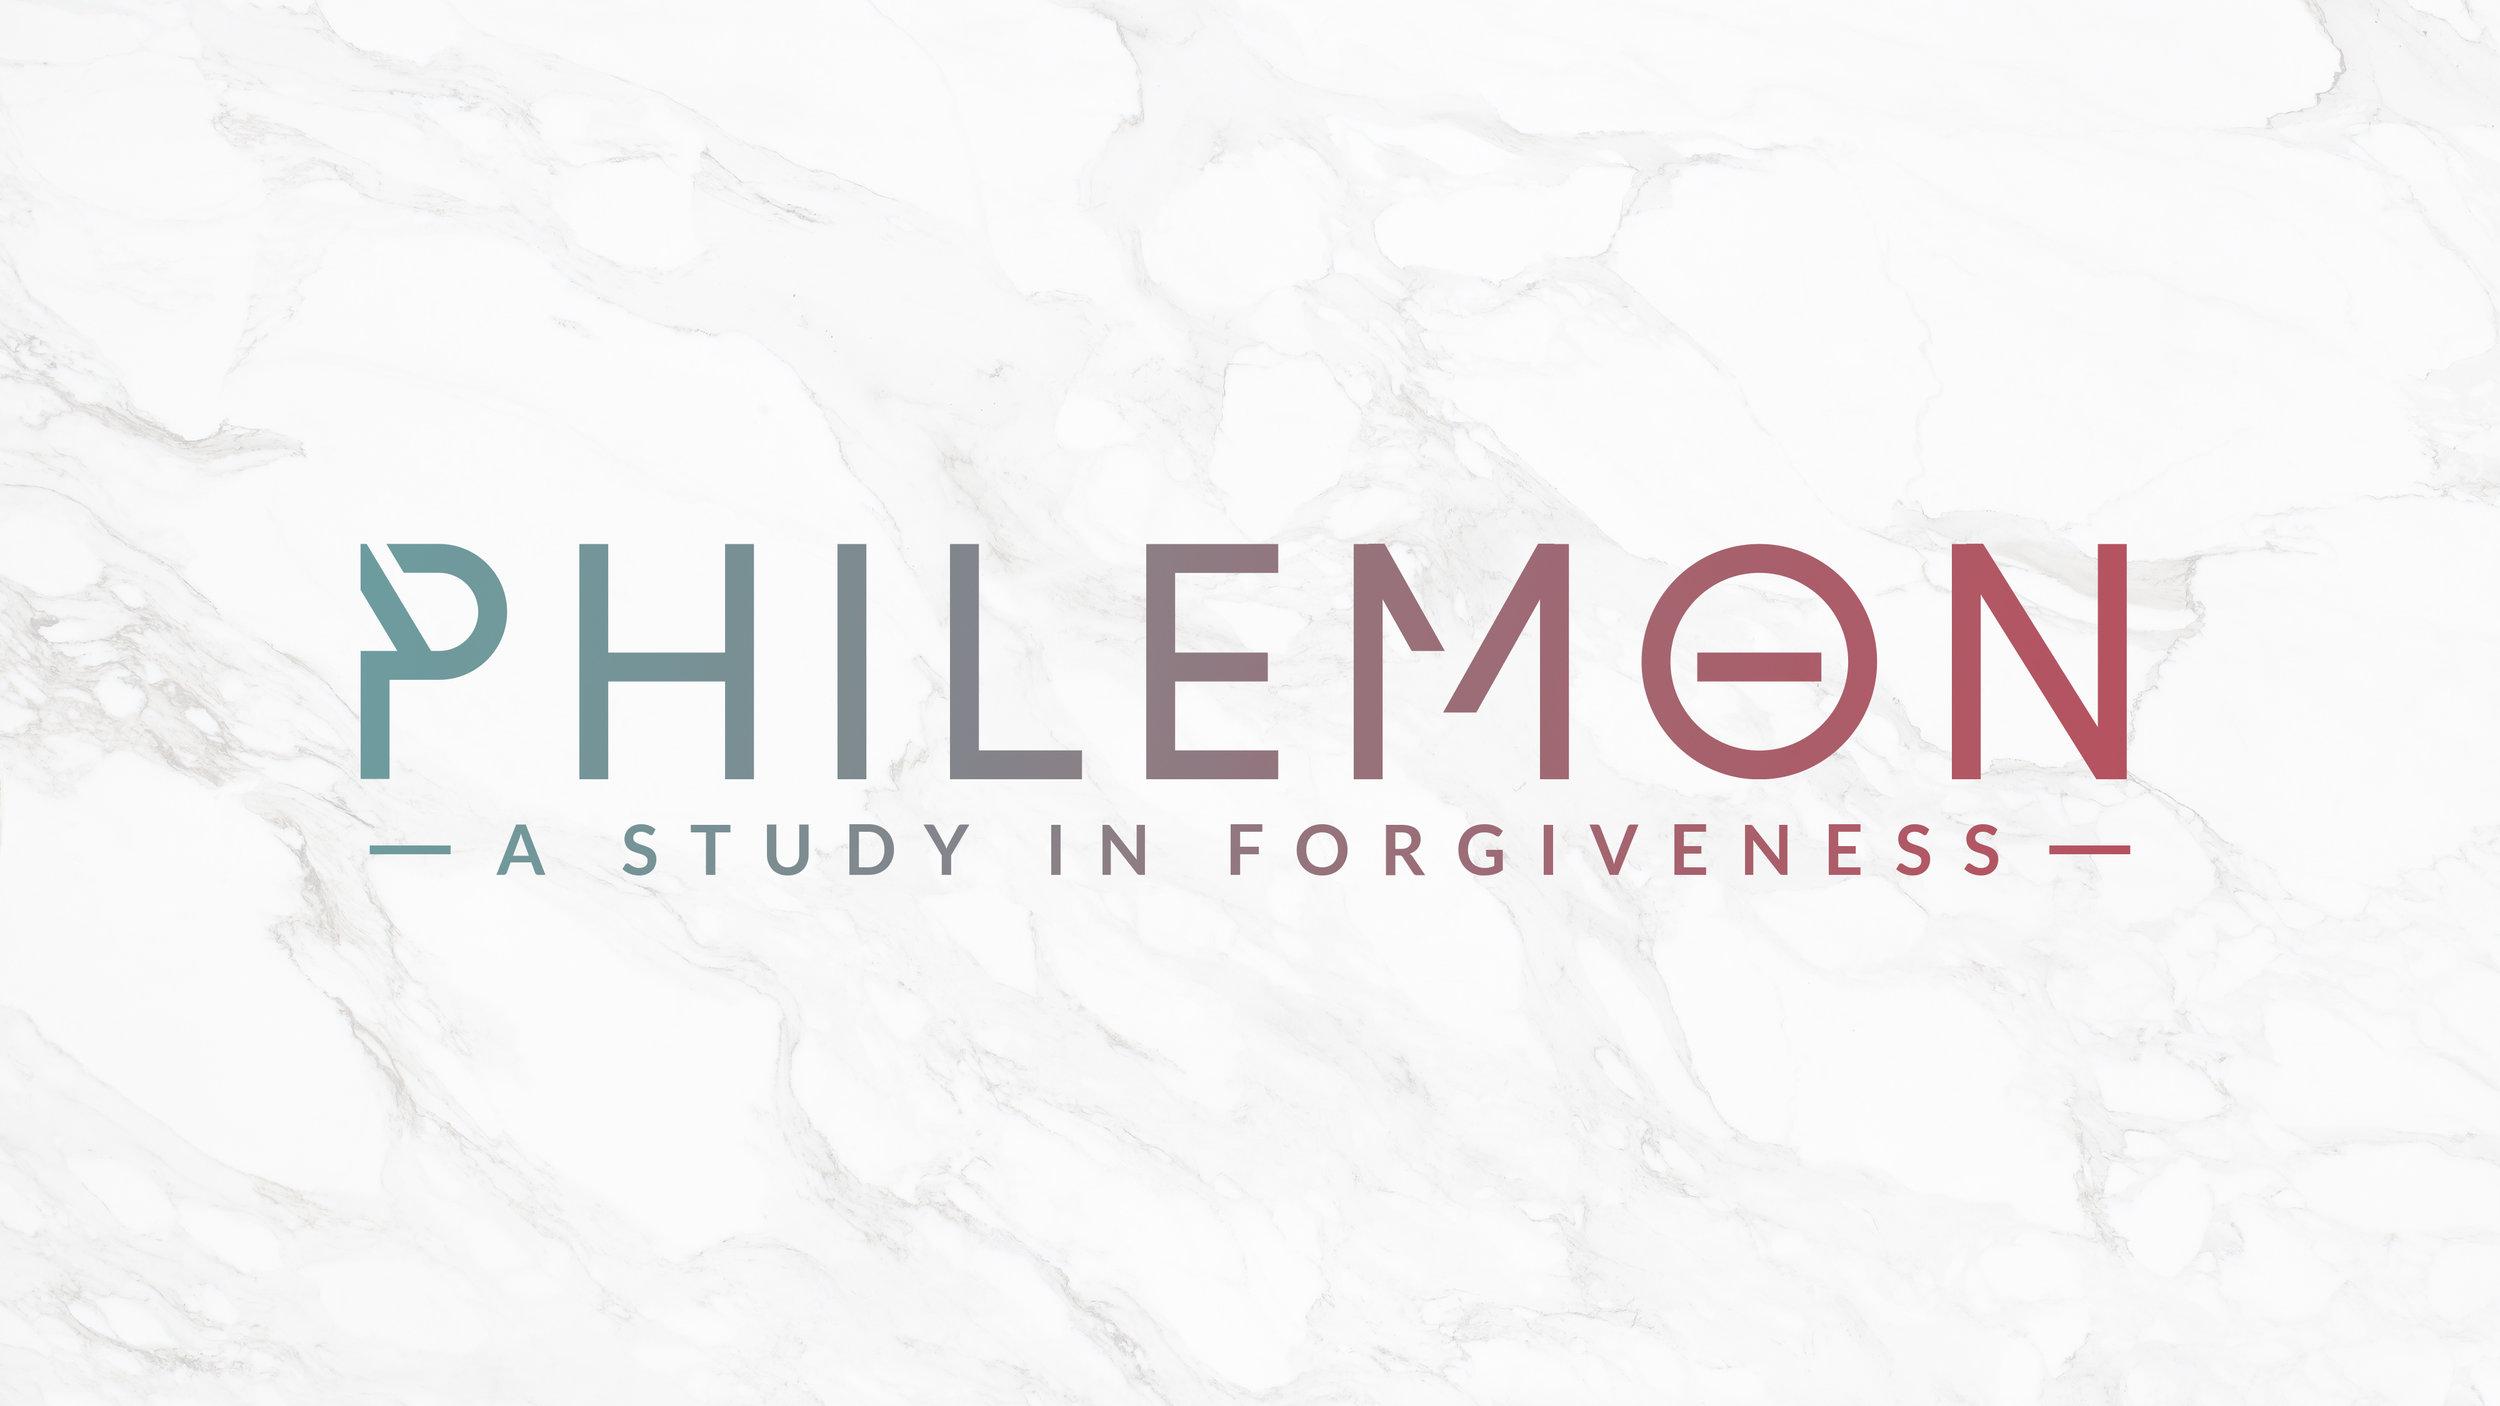 Philemon   A Study in Forgiveness